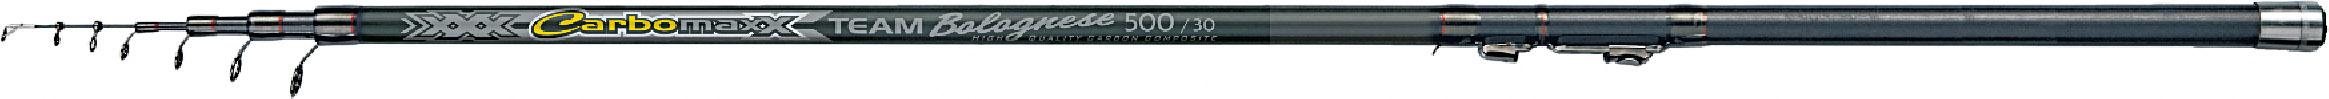 KONGER CARBOMAX SUPER BOLO 600CM/30G